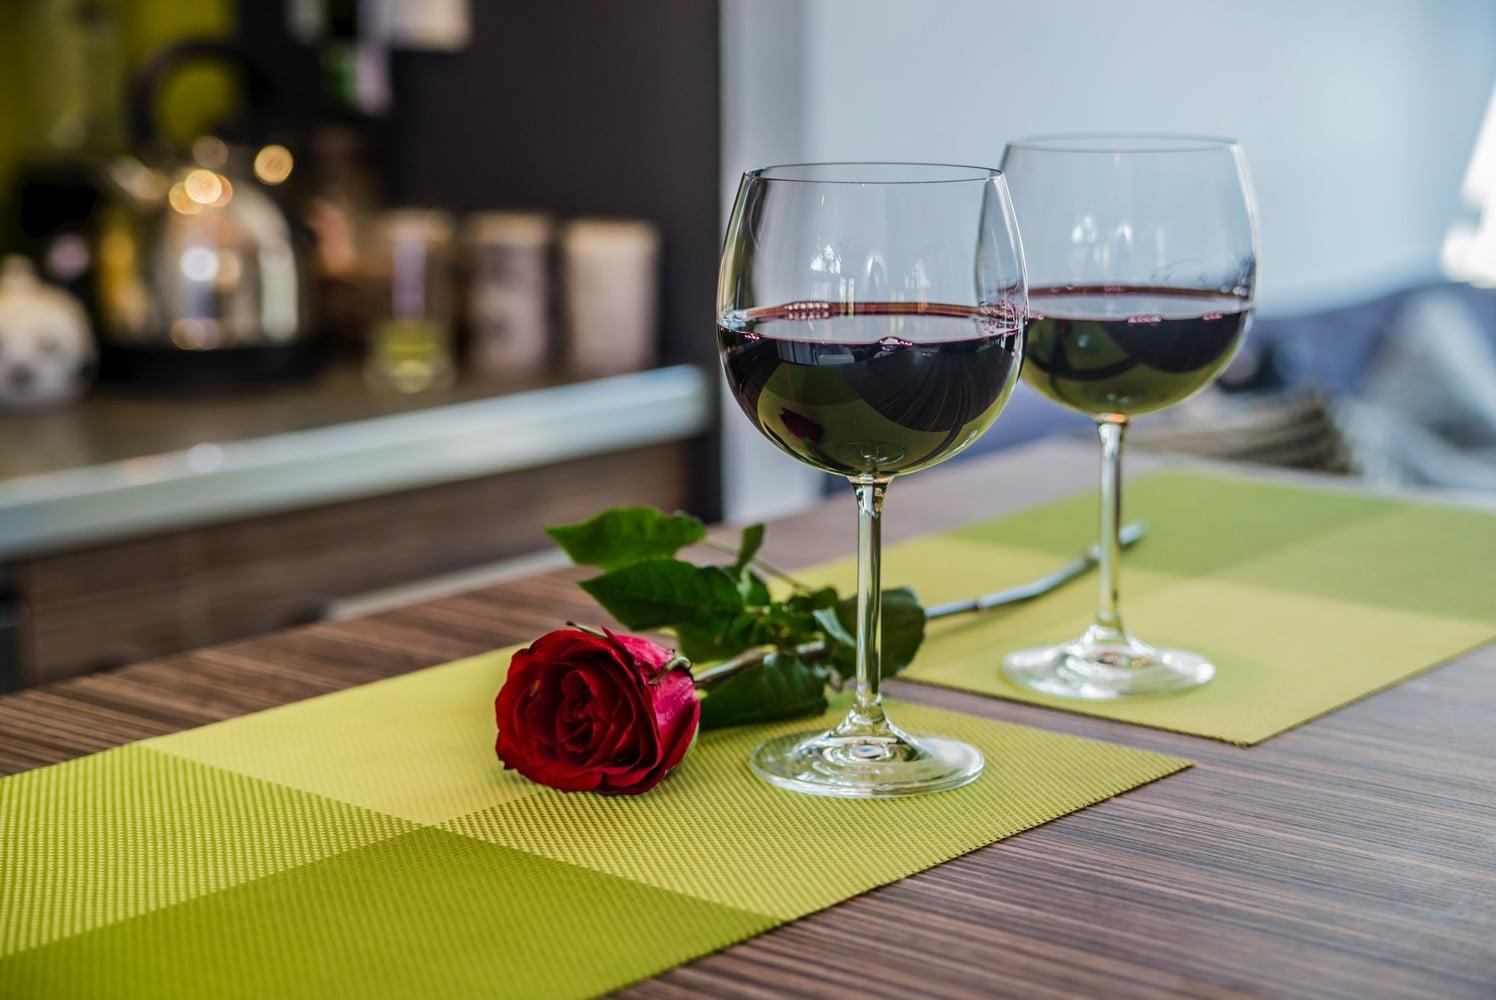 wine in glasses   date night in